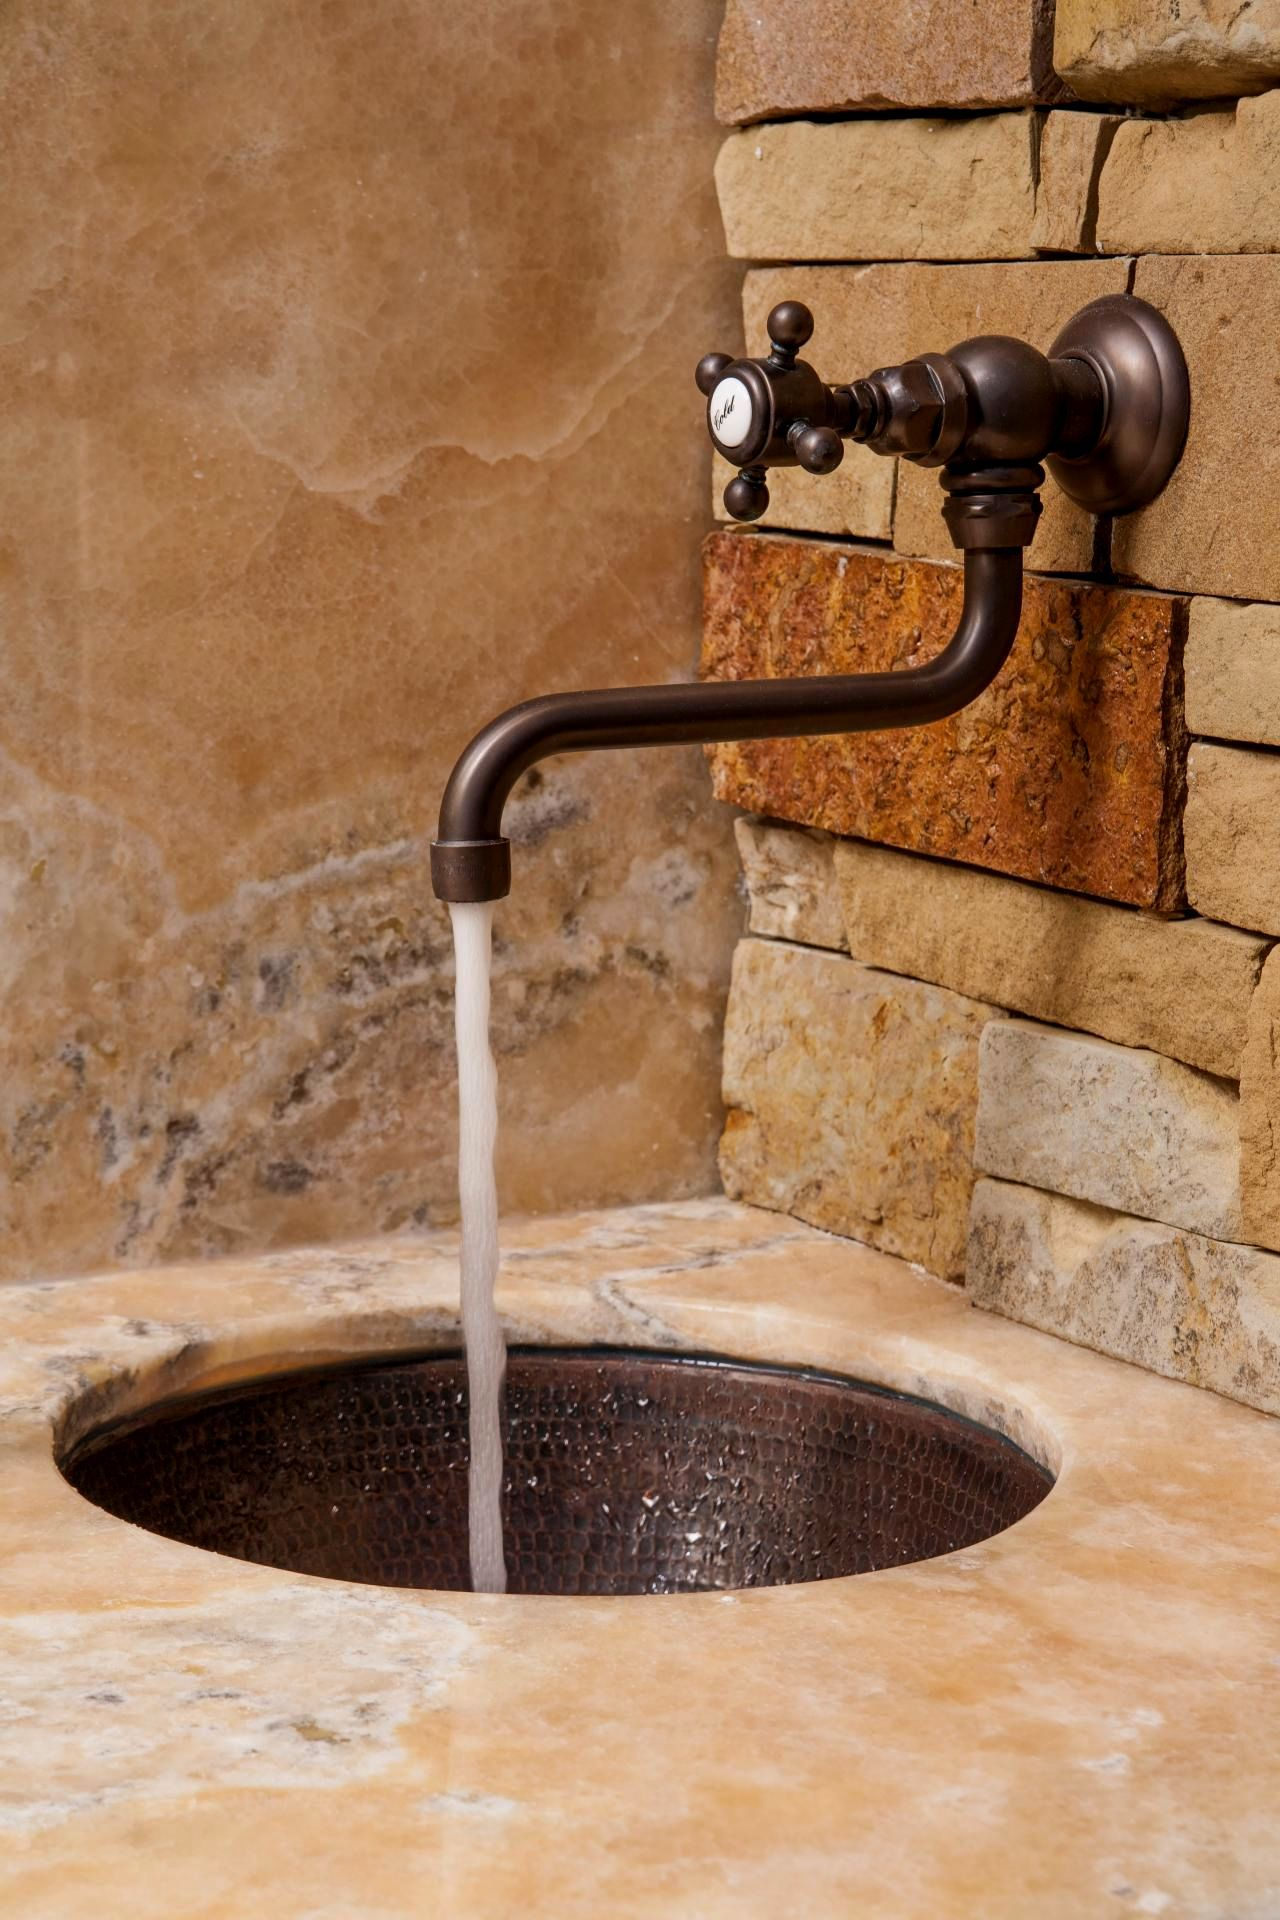 Design#: Outdoor Kitchen Sink Faucet – Design1024768 Outdoor ...